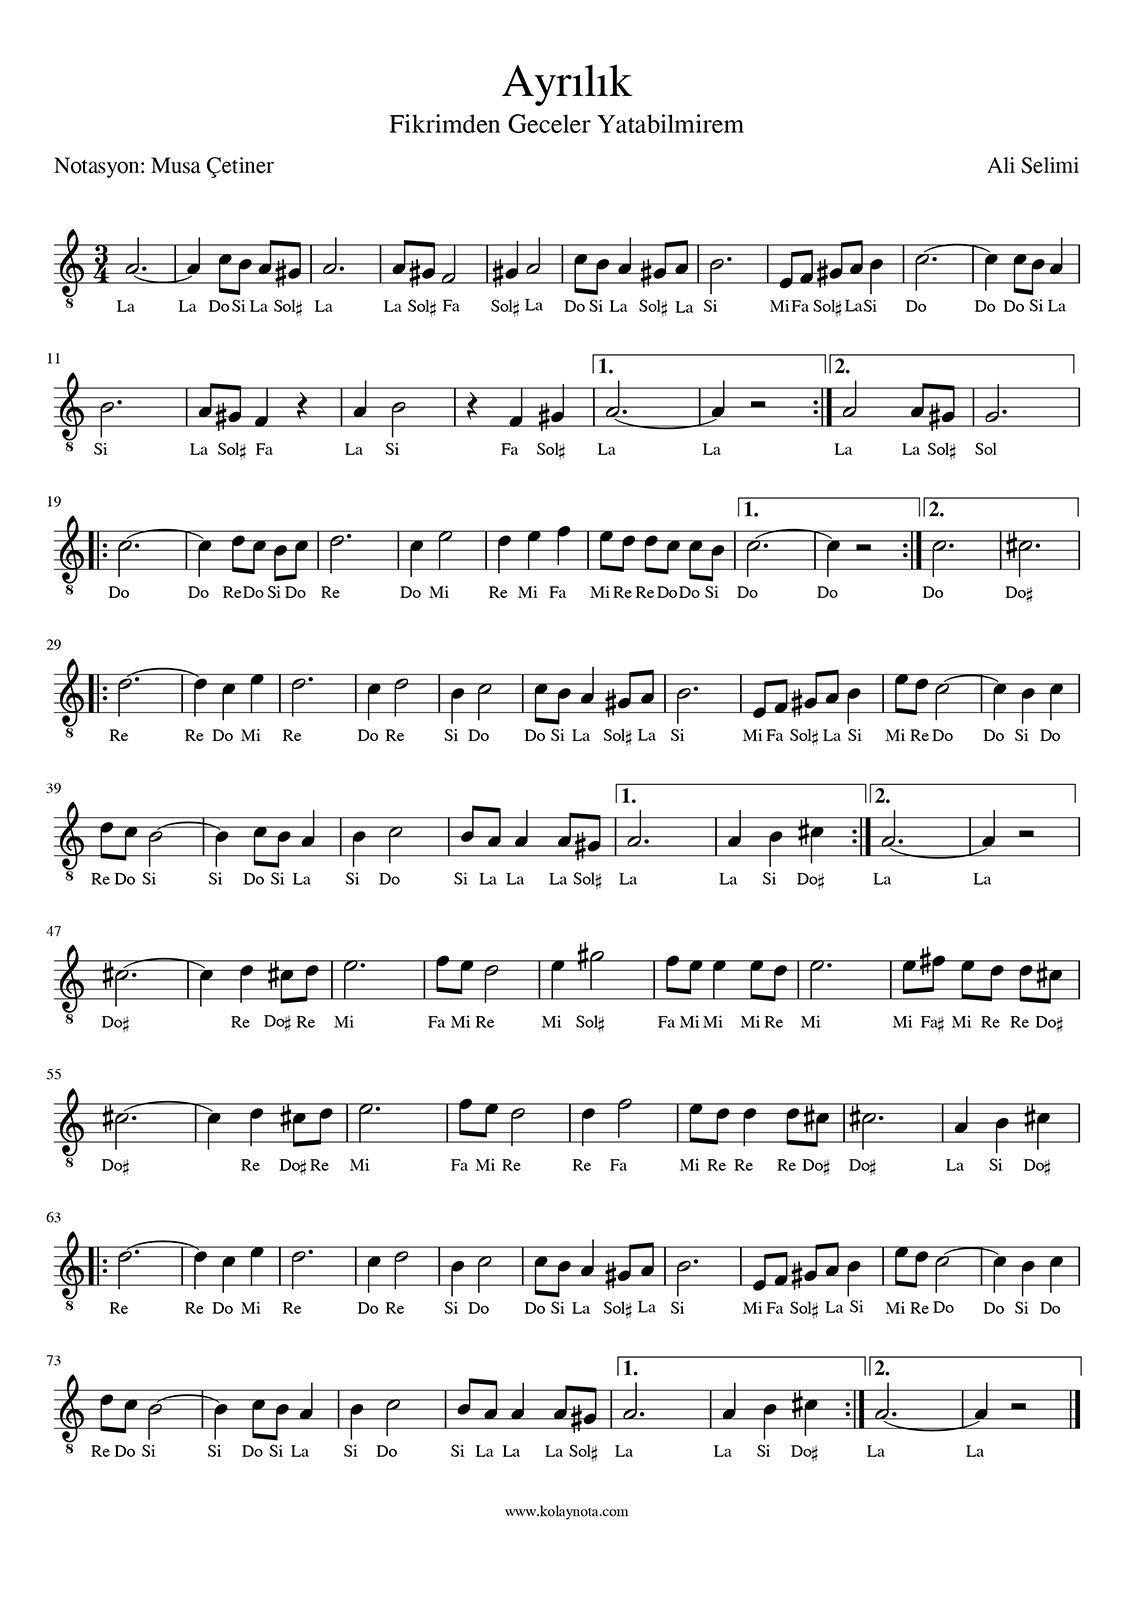 Ayrilik Fikrimden Geceler Kolay Nota Kolaynota Flut Muzik Notalari Notalara Dokulmus Muzik